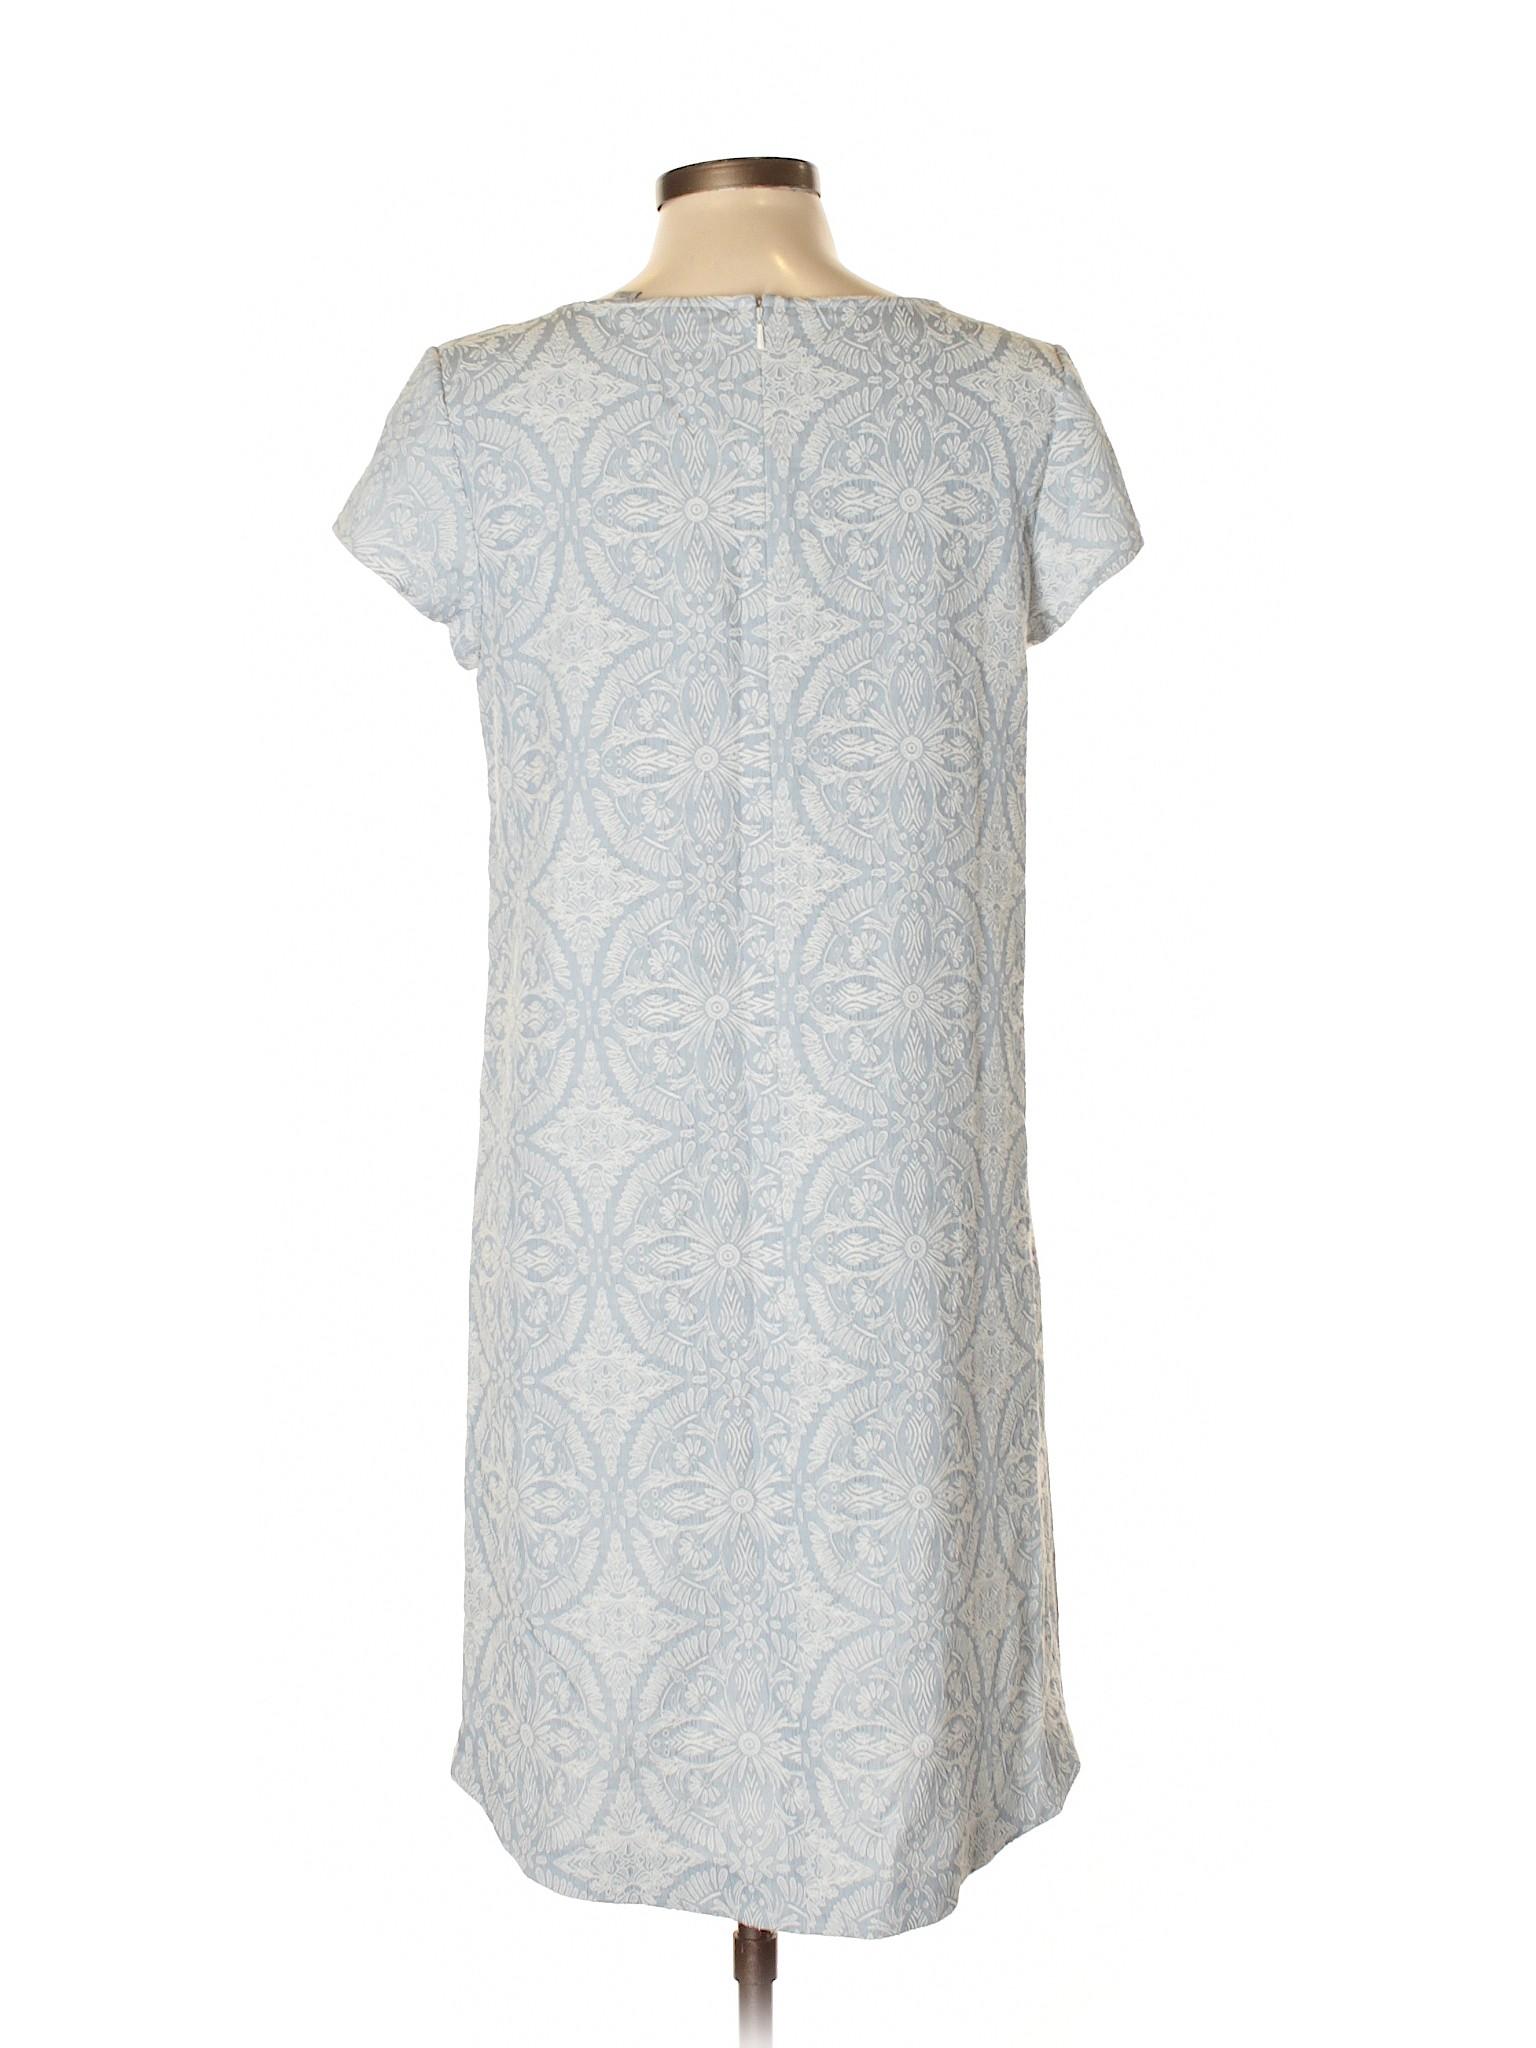 Casual Selling Halogen Selling Dress Halogen Dress Halogen Casual Selling Casual Halogen Dress Selling Casual wAtx5q1